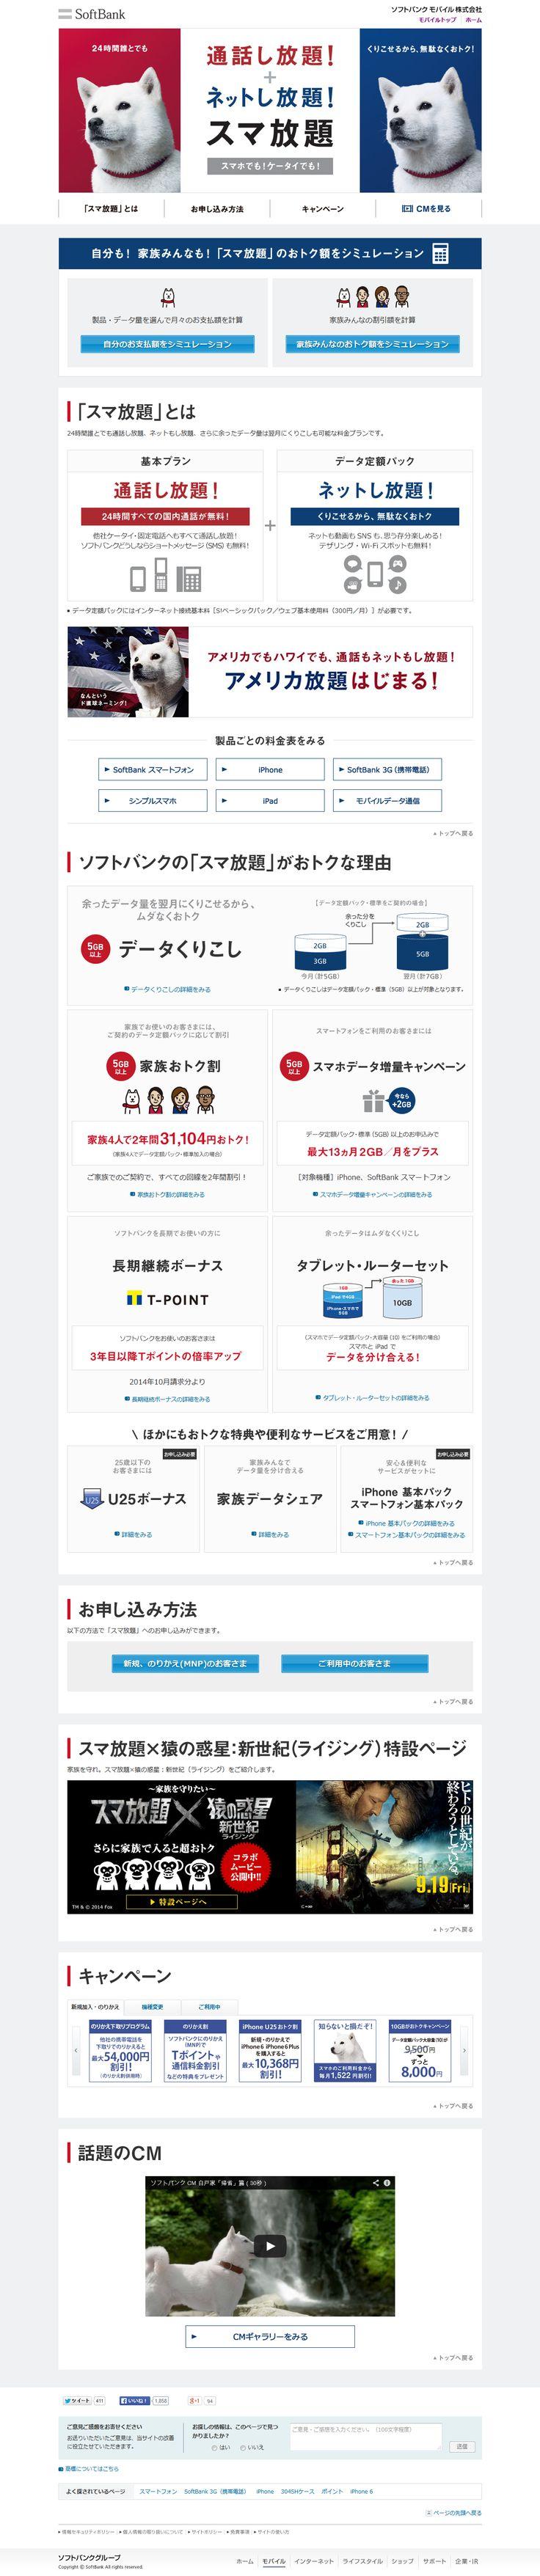 http://www.softbank.jp/mobile/special/sumahodai/